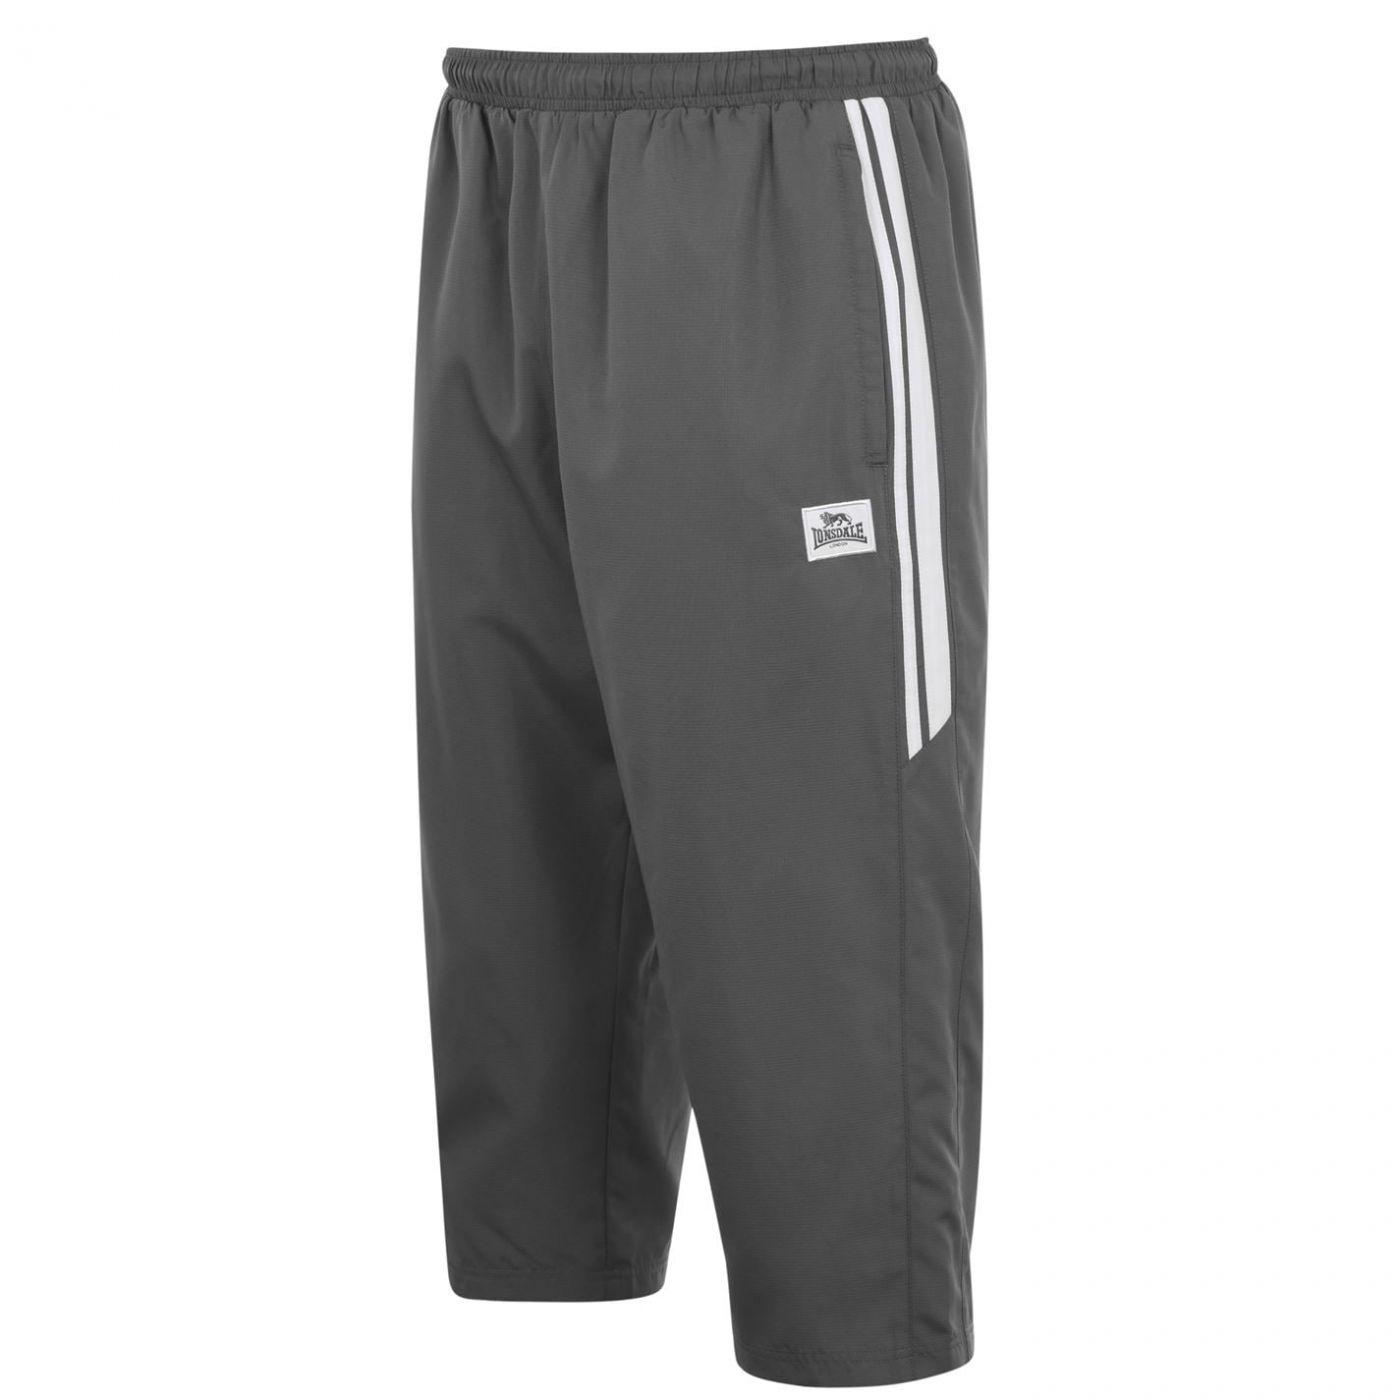 Men's shorts Lonsdale 2 stripe